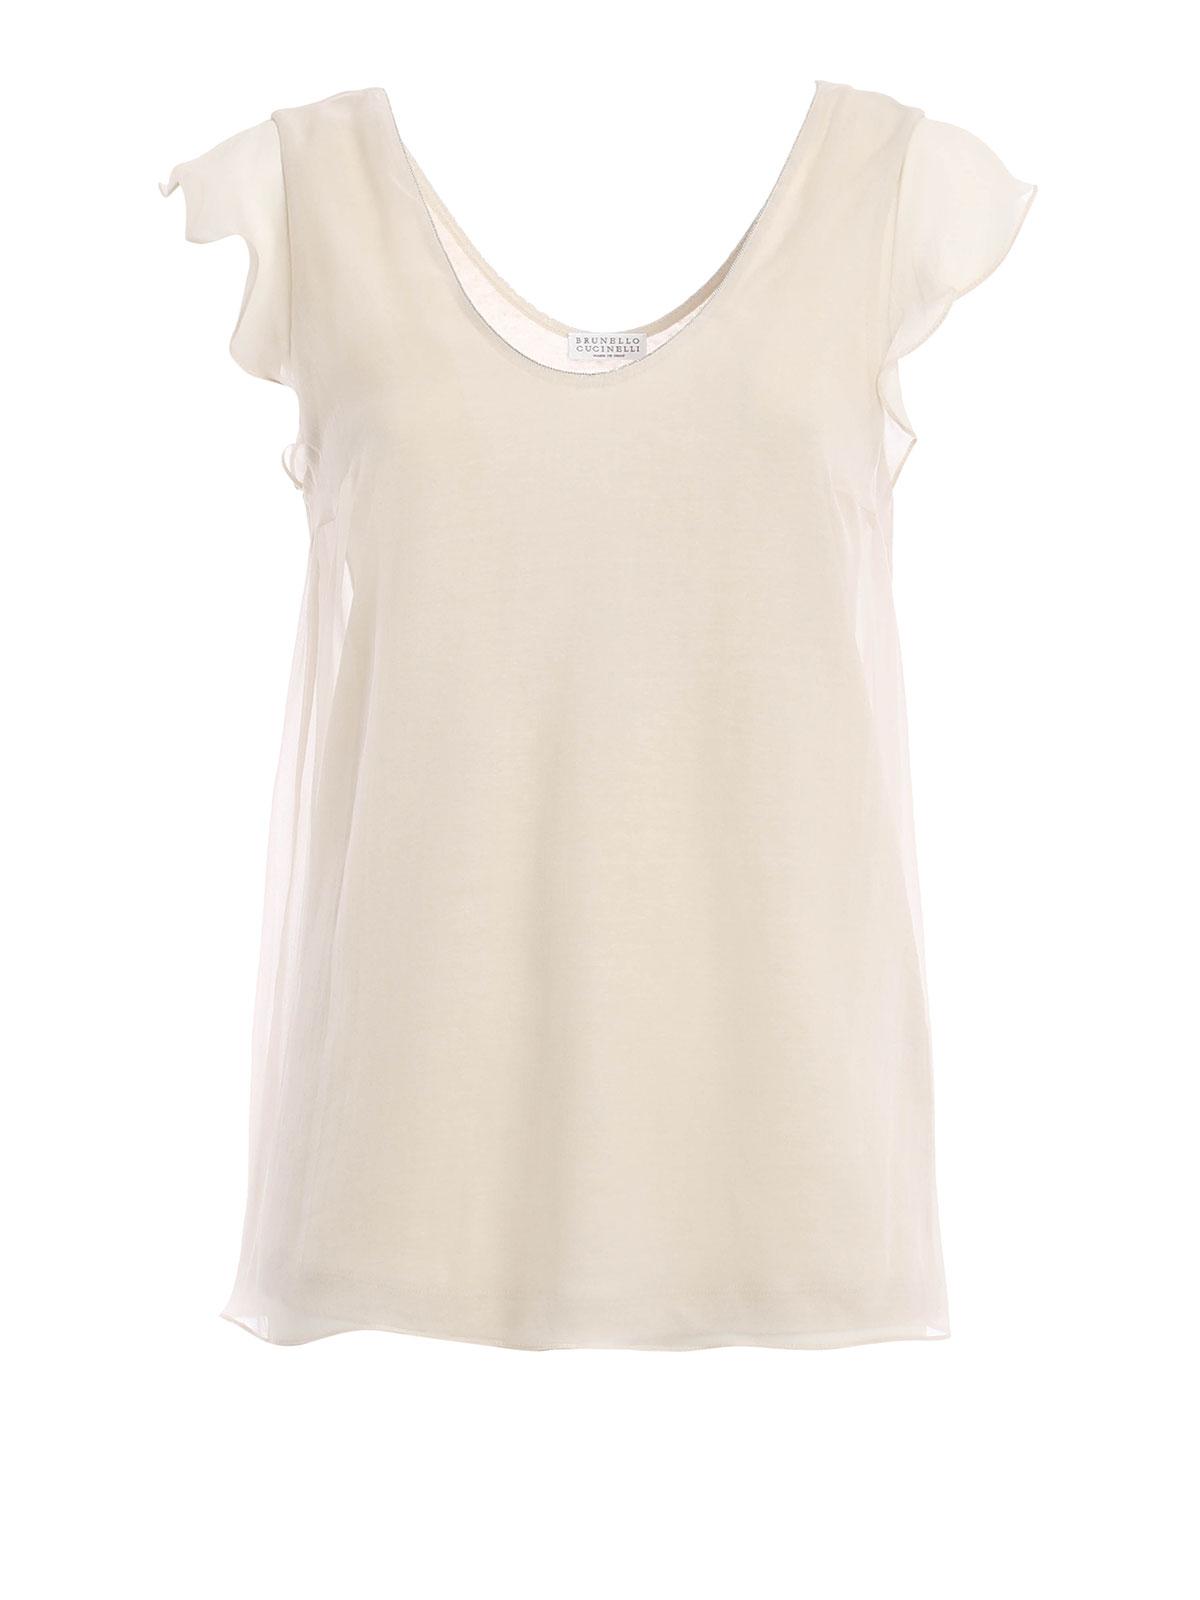 Silk T Shirt By Brunello Cucinelli Tops Tank Tops